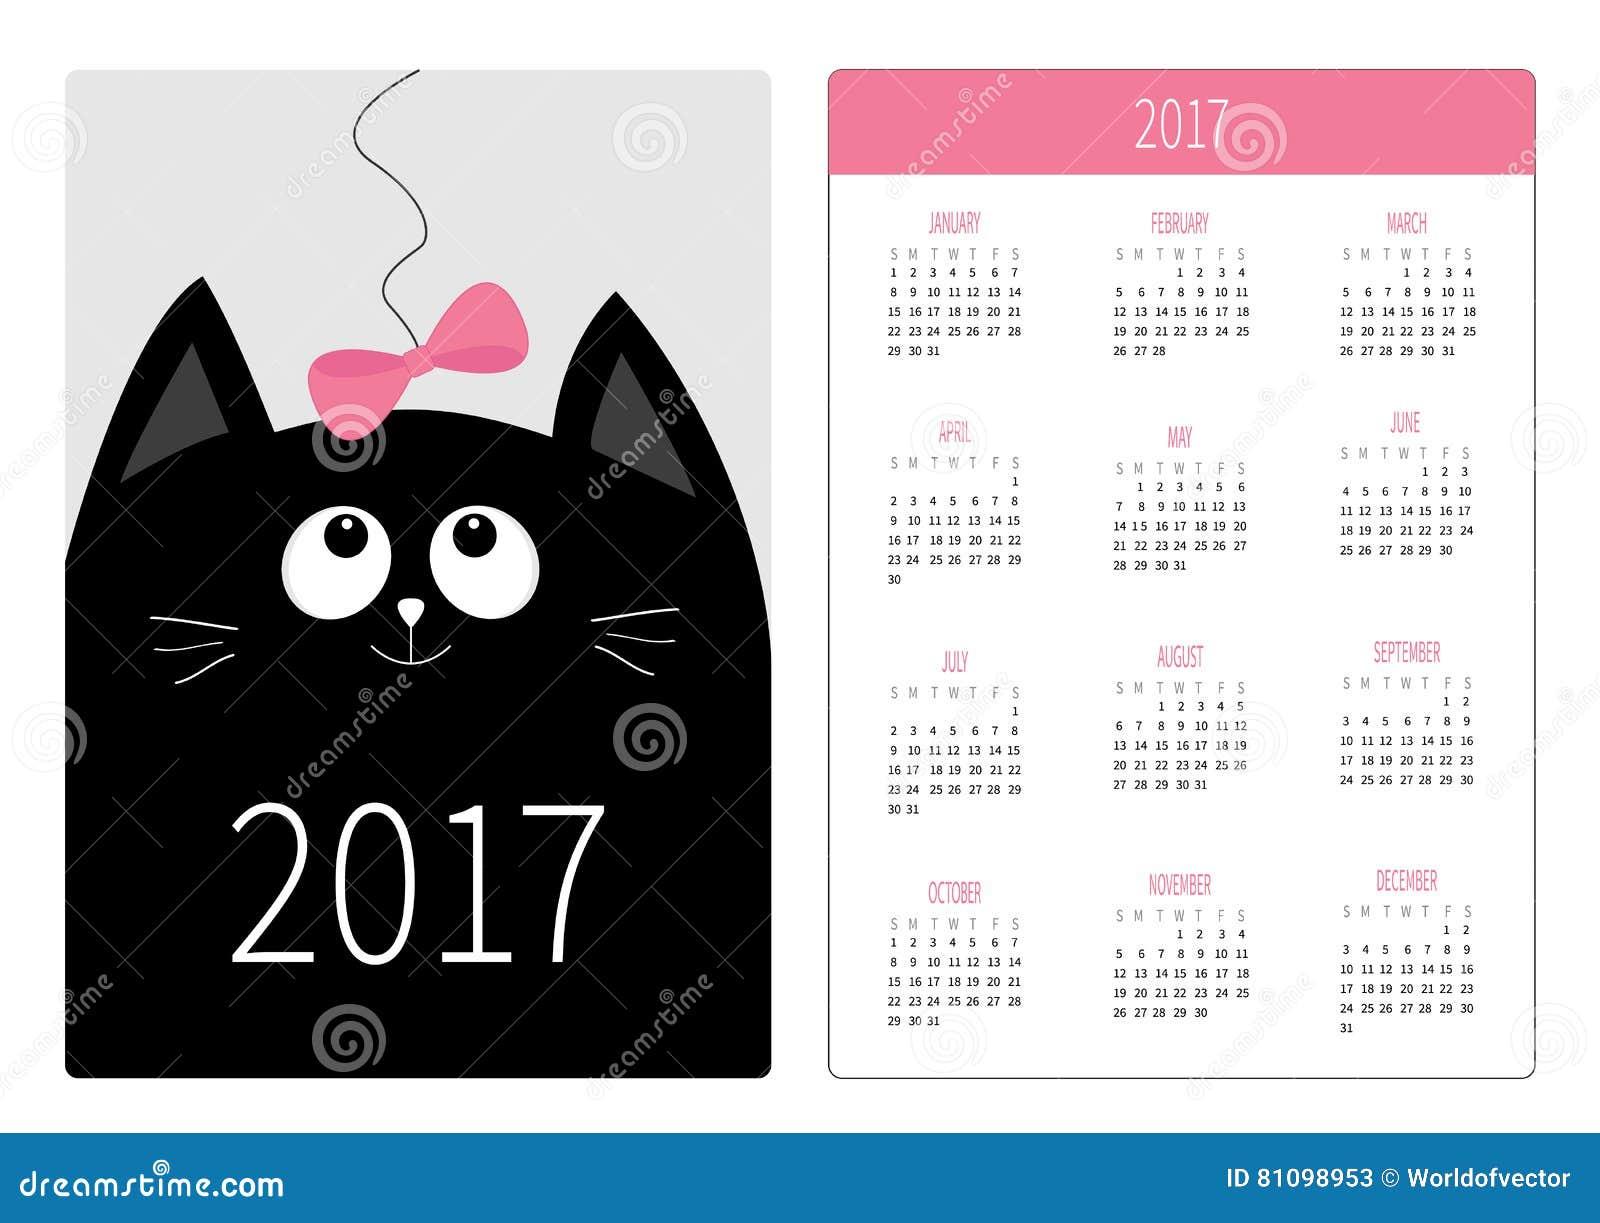 Calendar Design Tutorial : Vertical pocket calendar for year cartoon vector